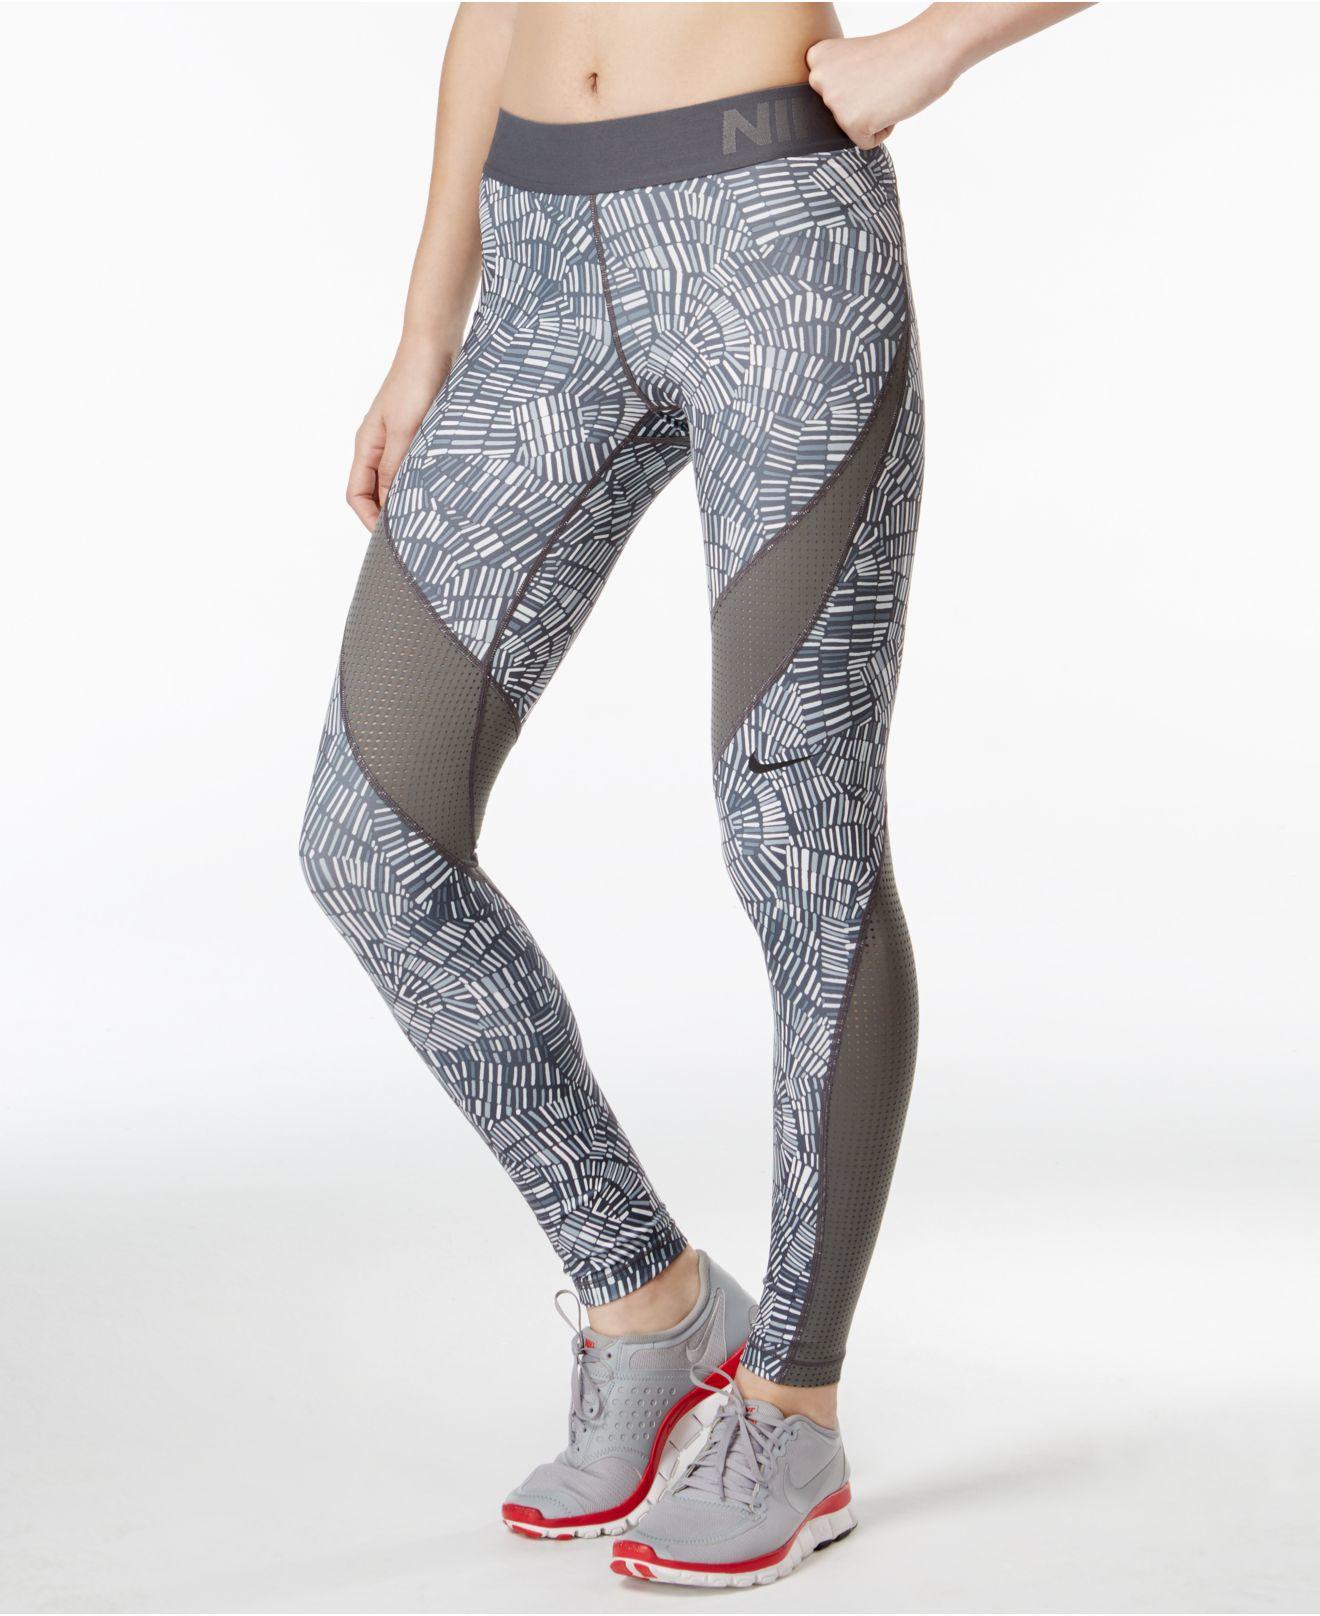 Legging Pro hypercool Nike